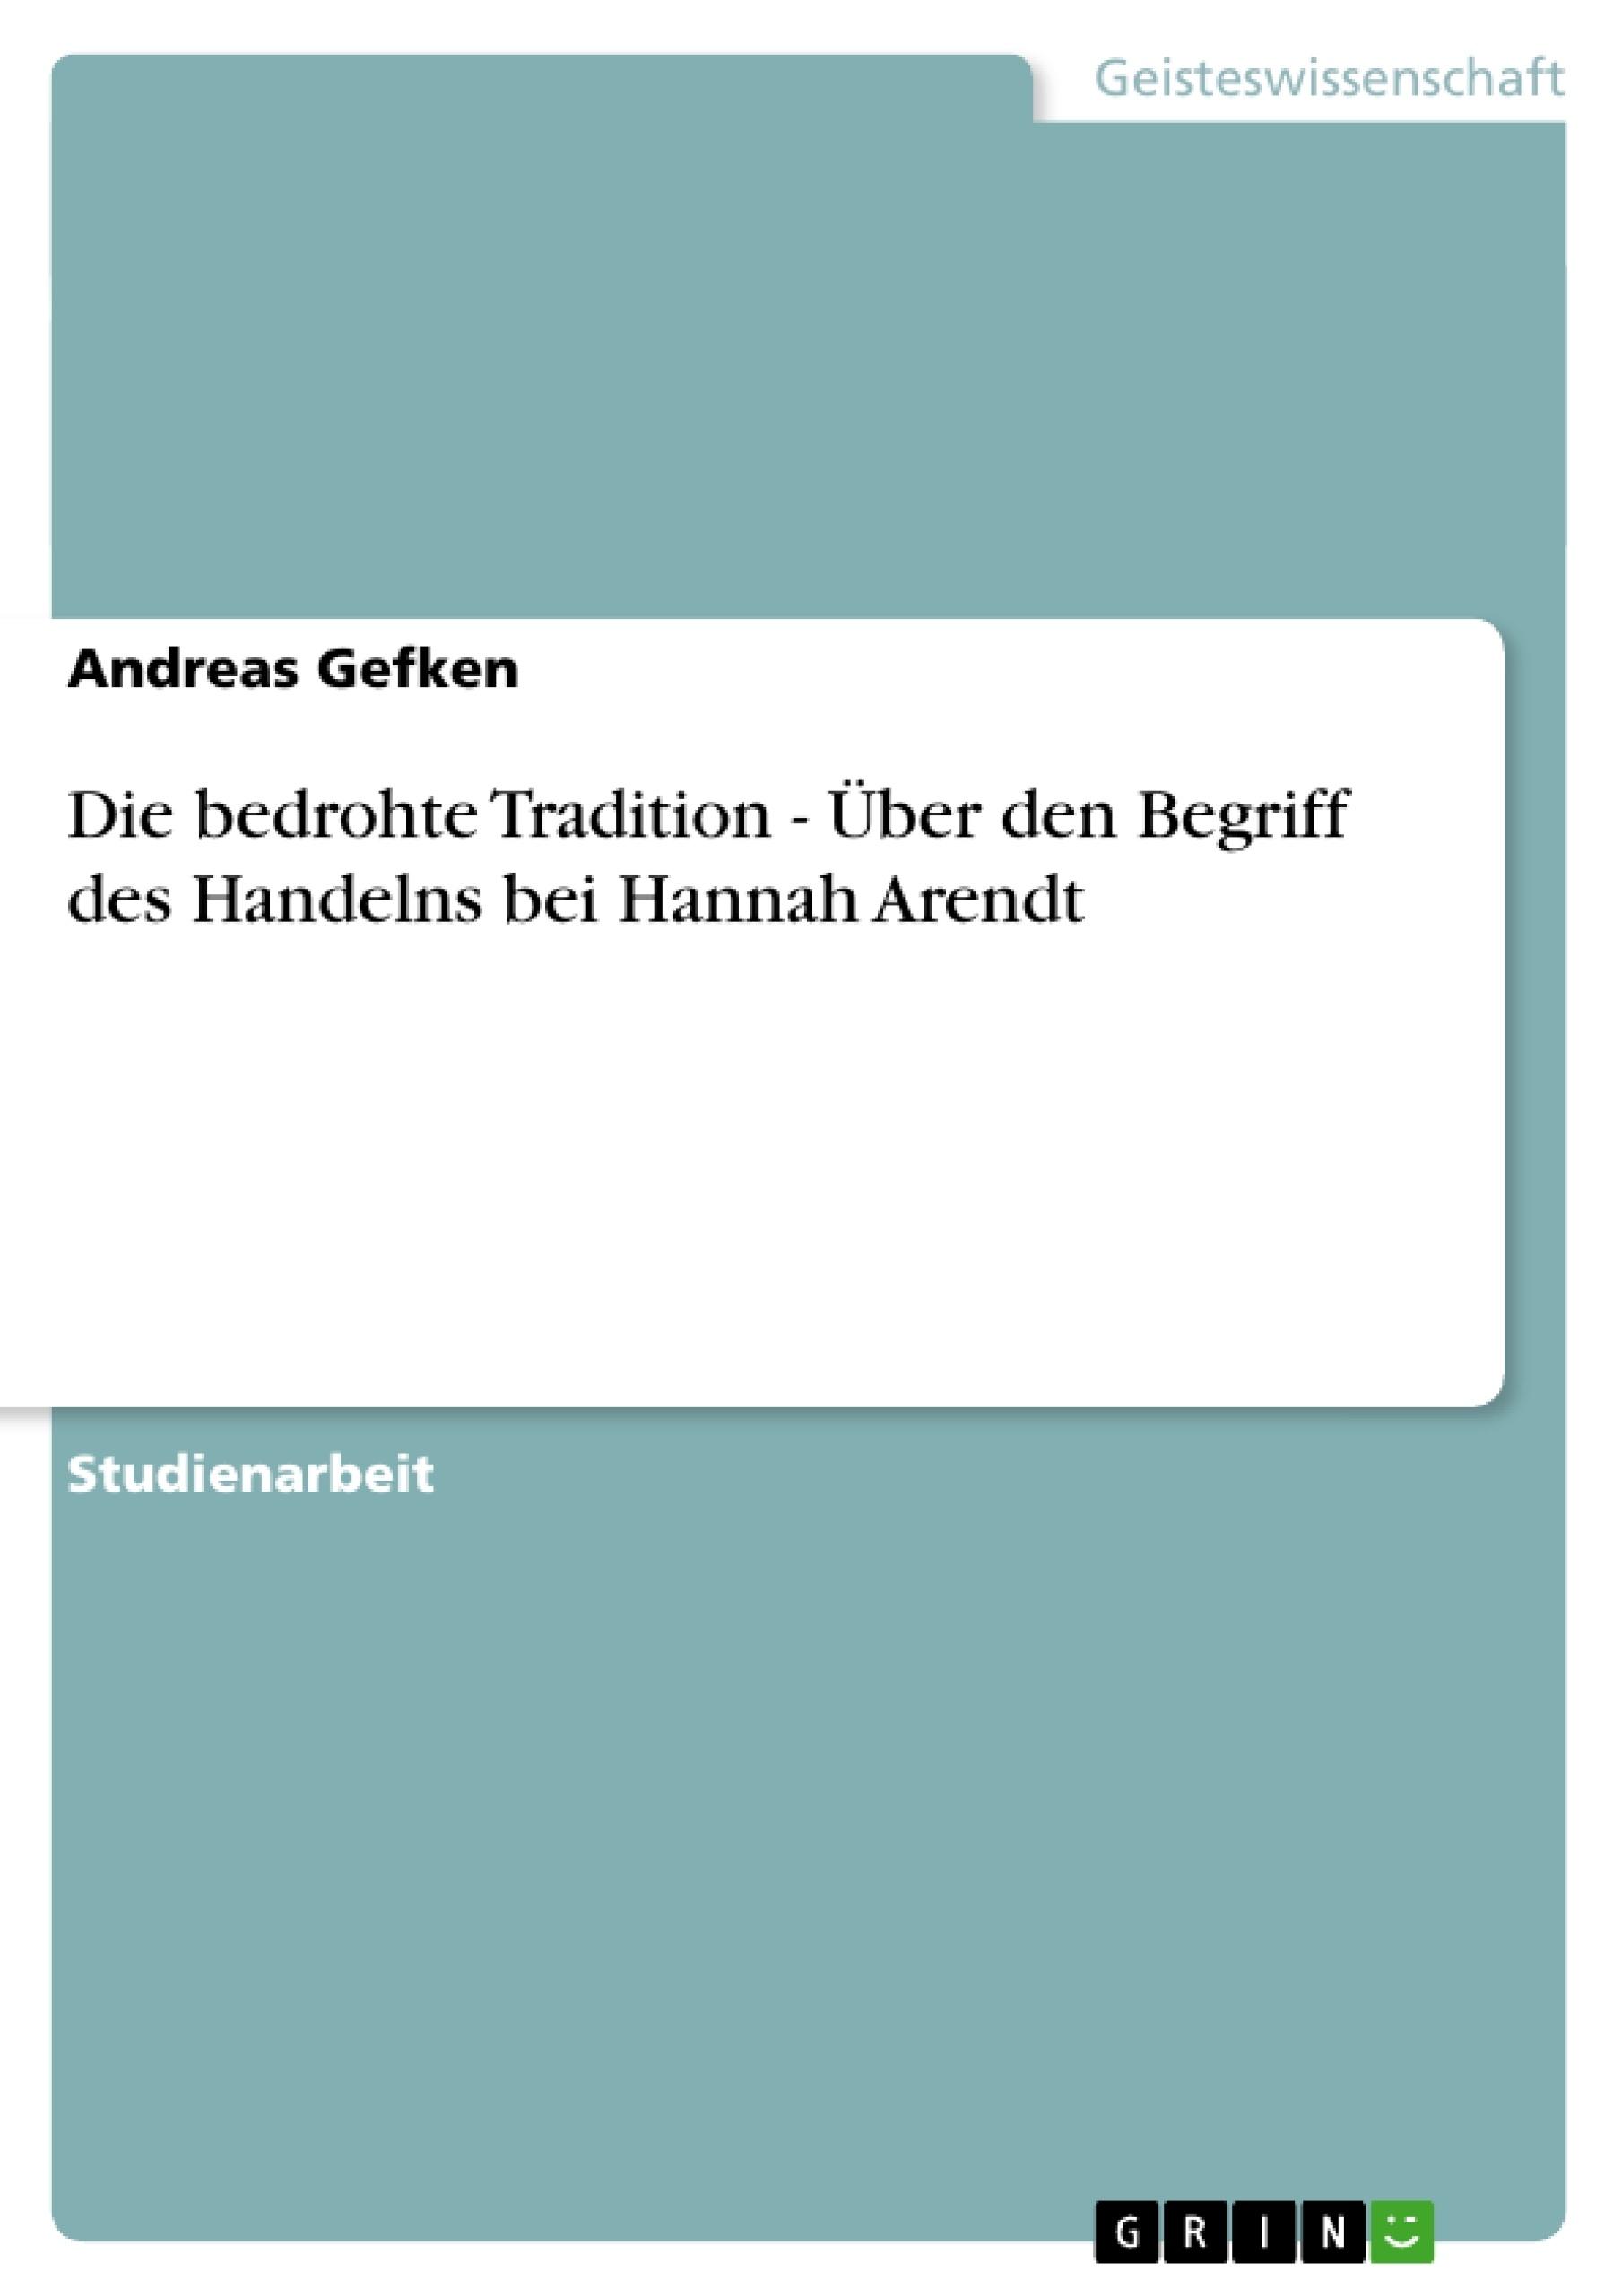 Titel: Die bedrohte Tradition - Über den Begriff des Handelns bei Hannah Arendt